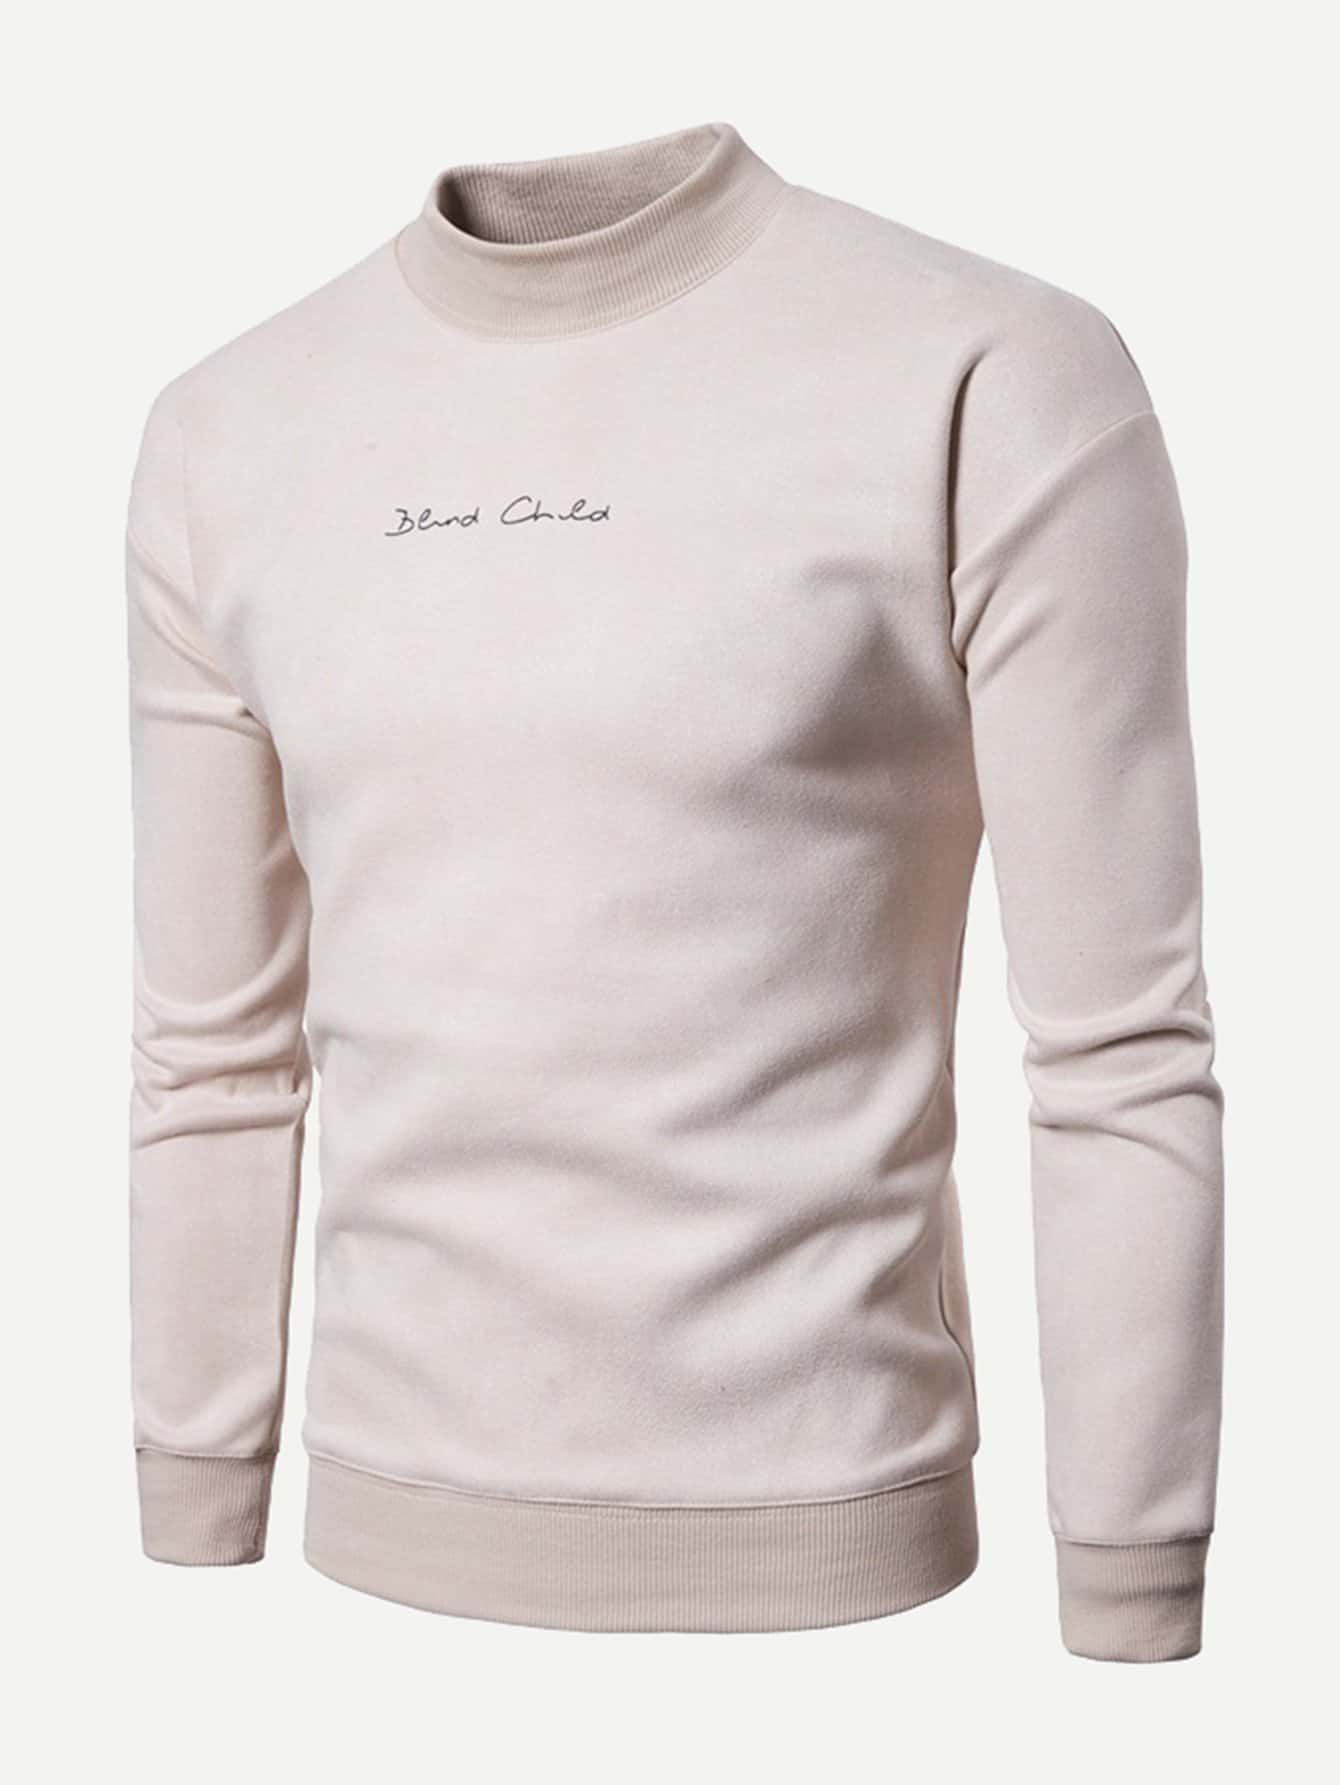 Men Letter Embroidery Plain Sweatshirt men letter embroidery side jeans